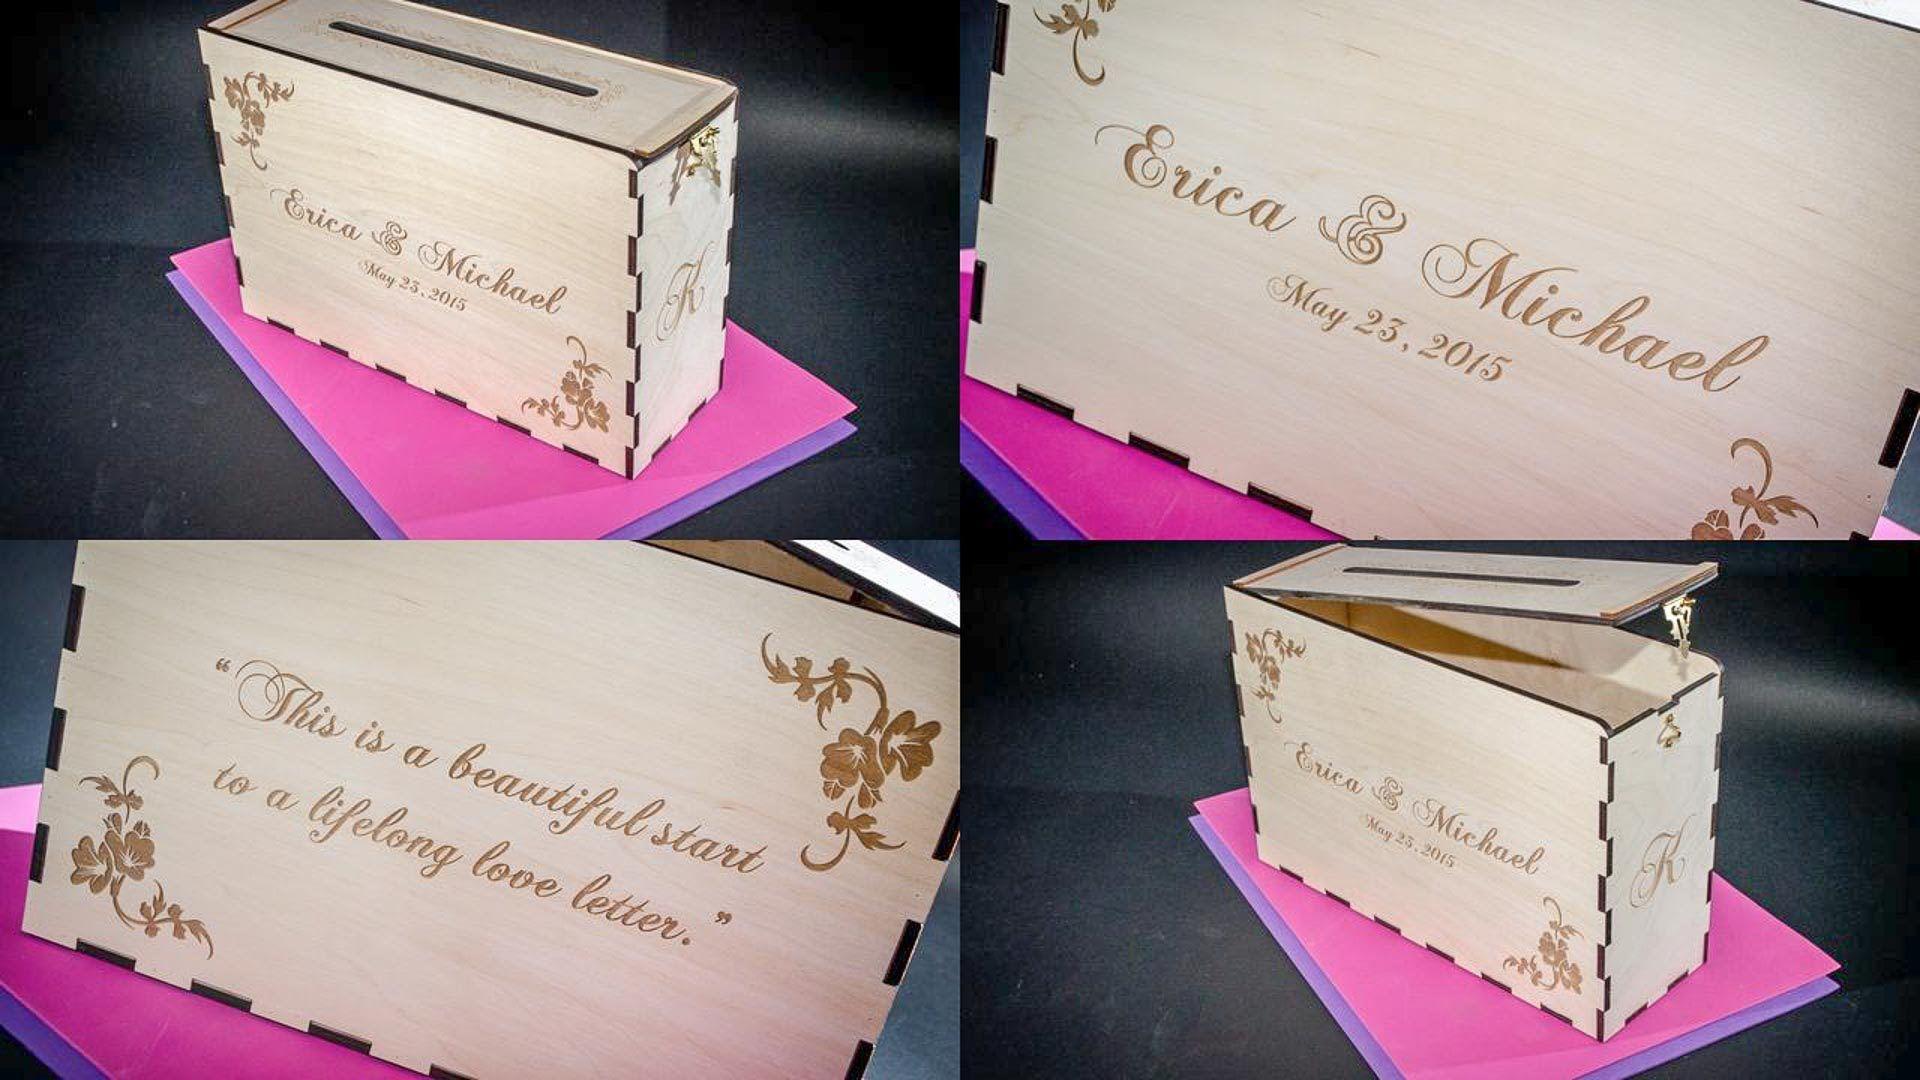 Wedding Card Or Money Box For Erica Michael: Wedding Card Box For Cash At Reisefeber.org